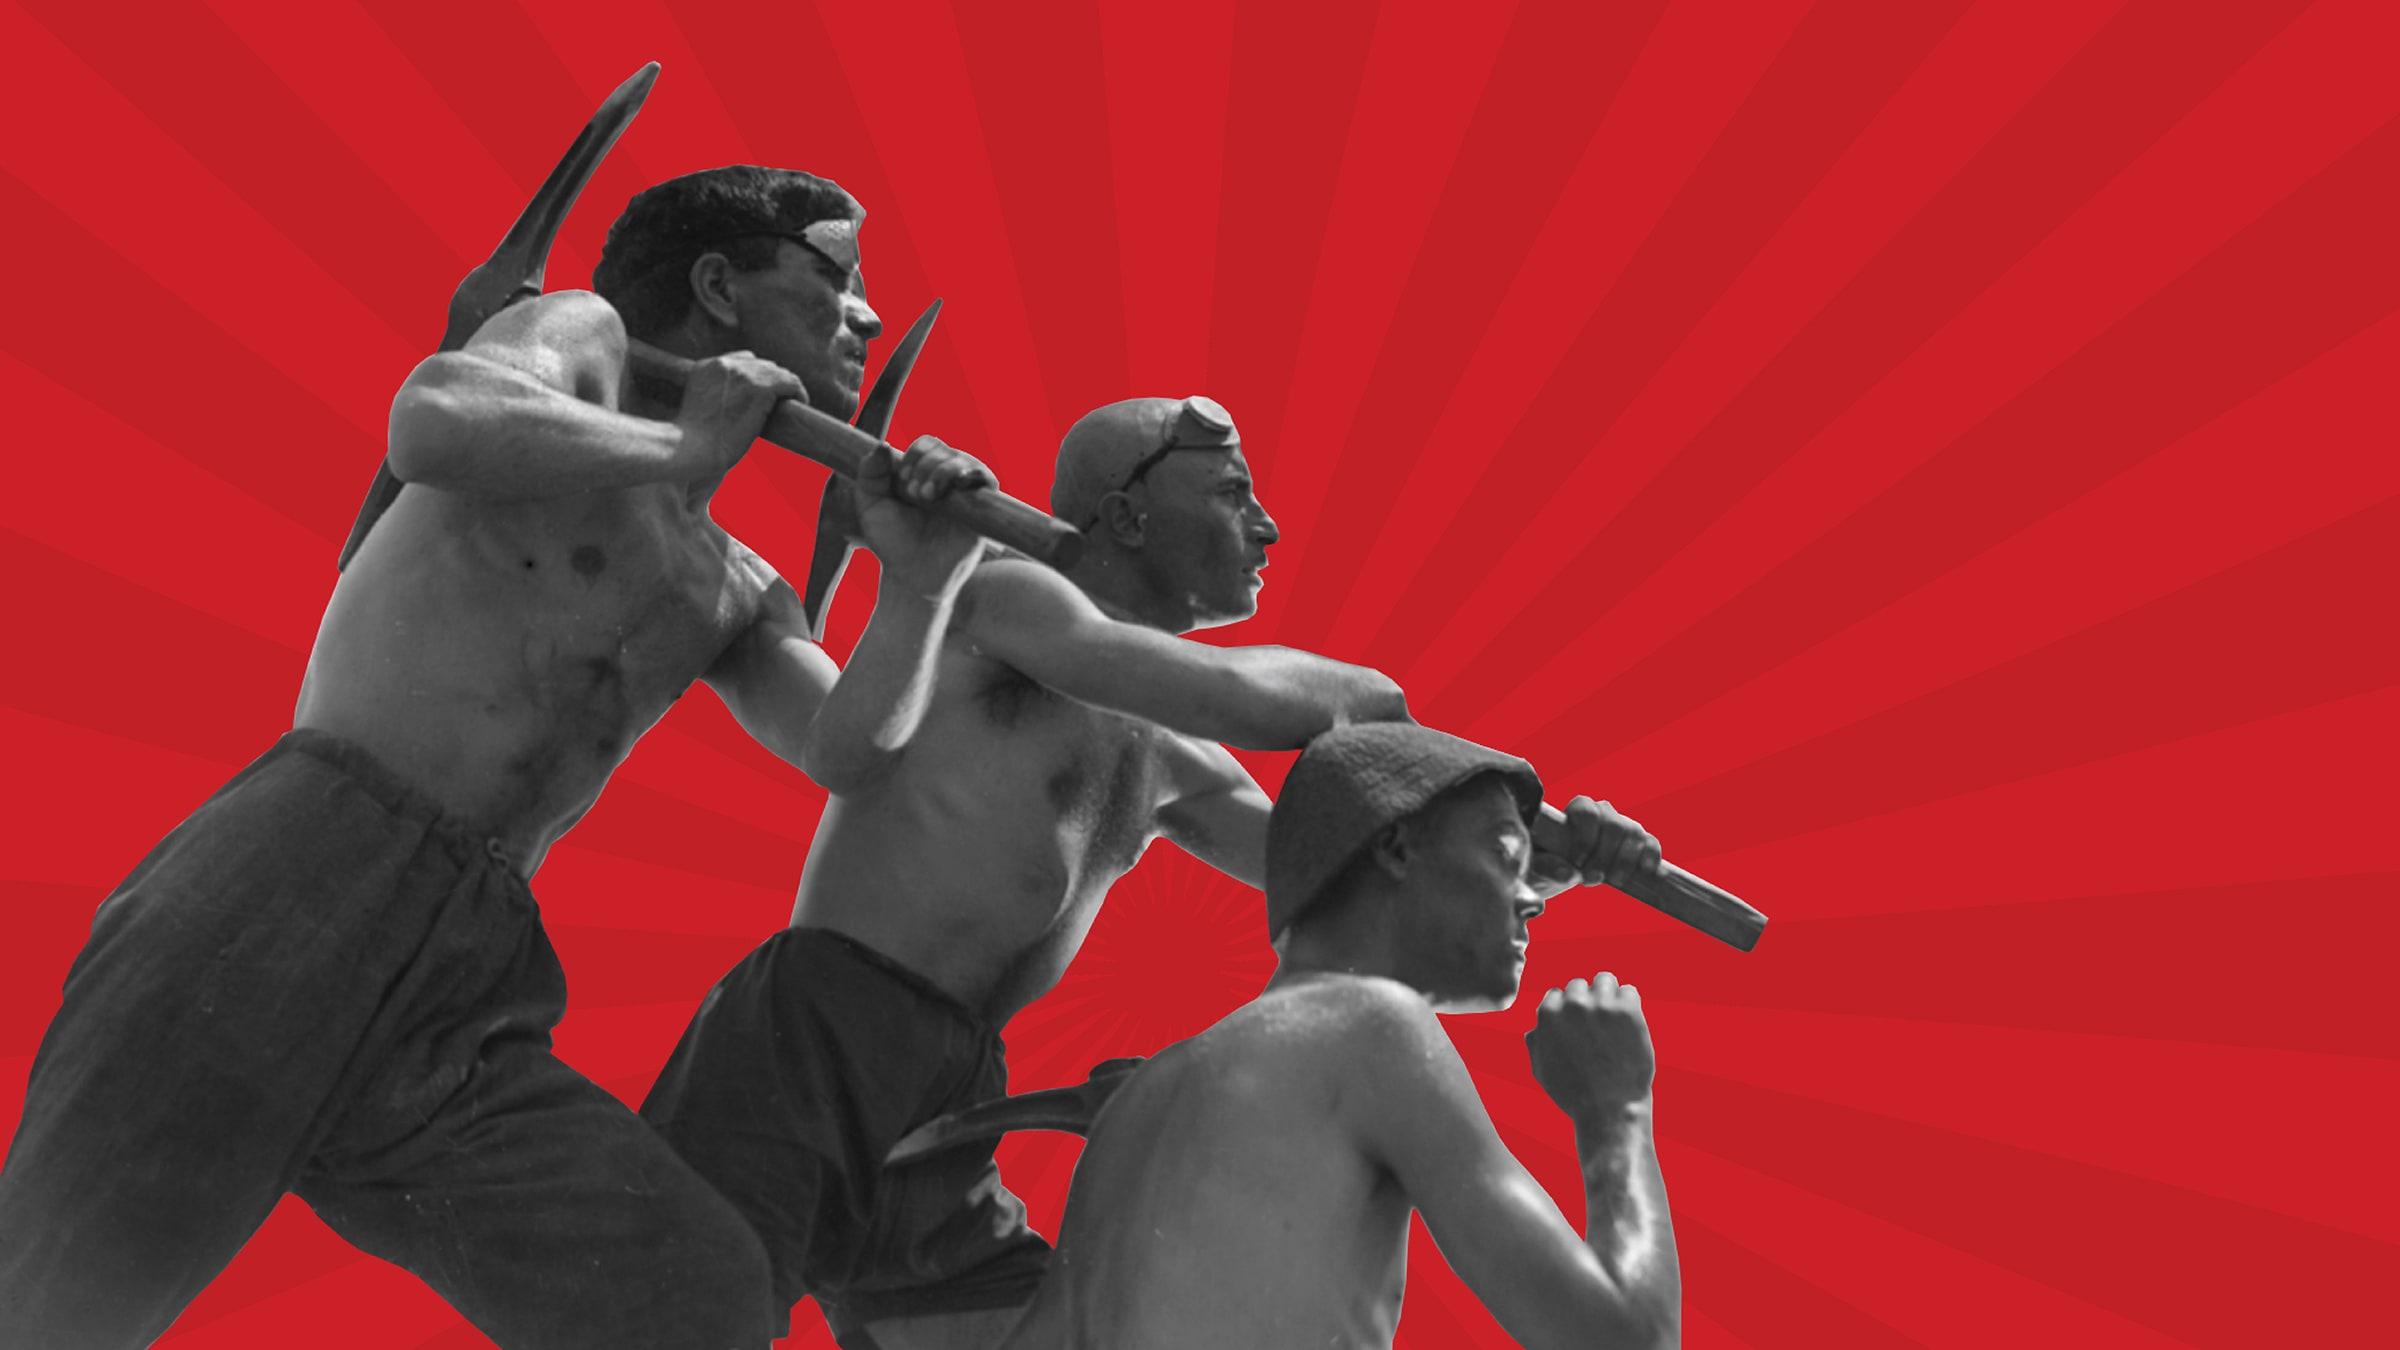 Kızıl Devrim <br> Sovyet Cevherleri